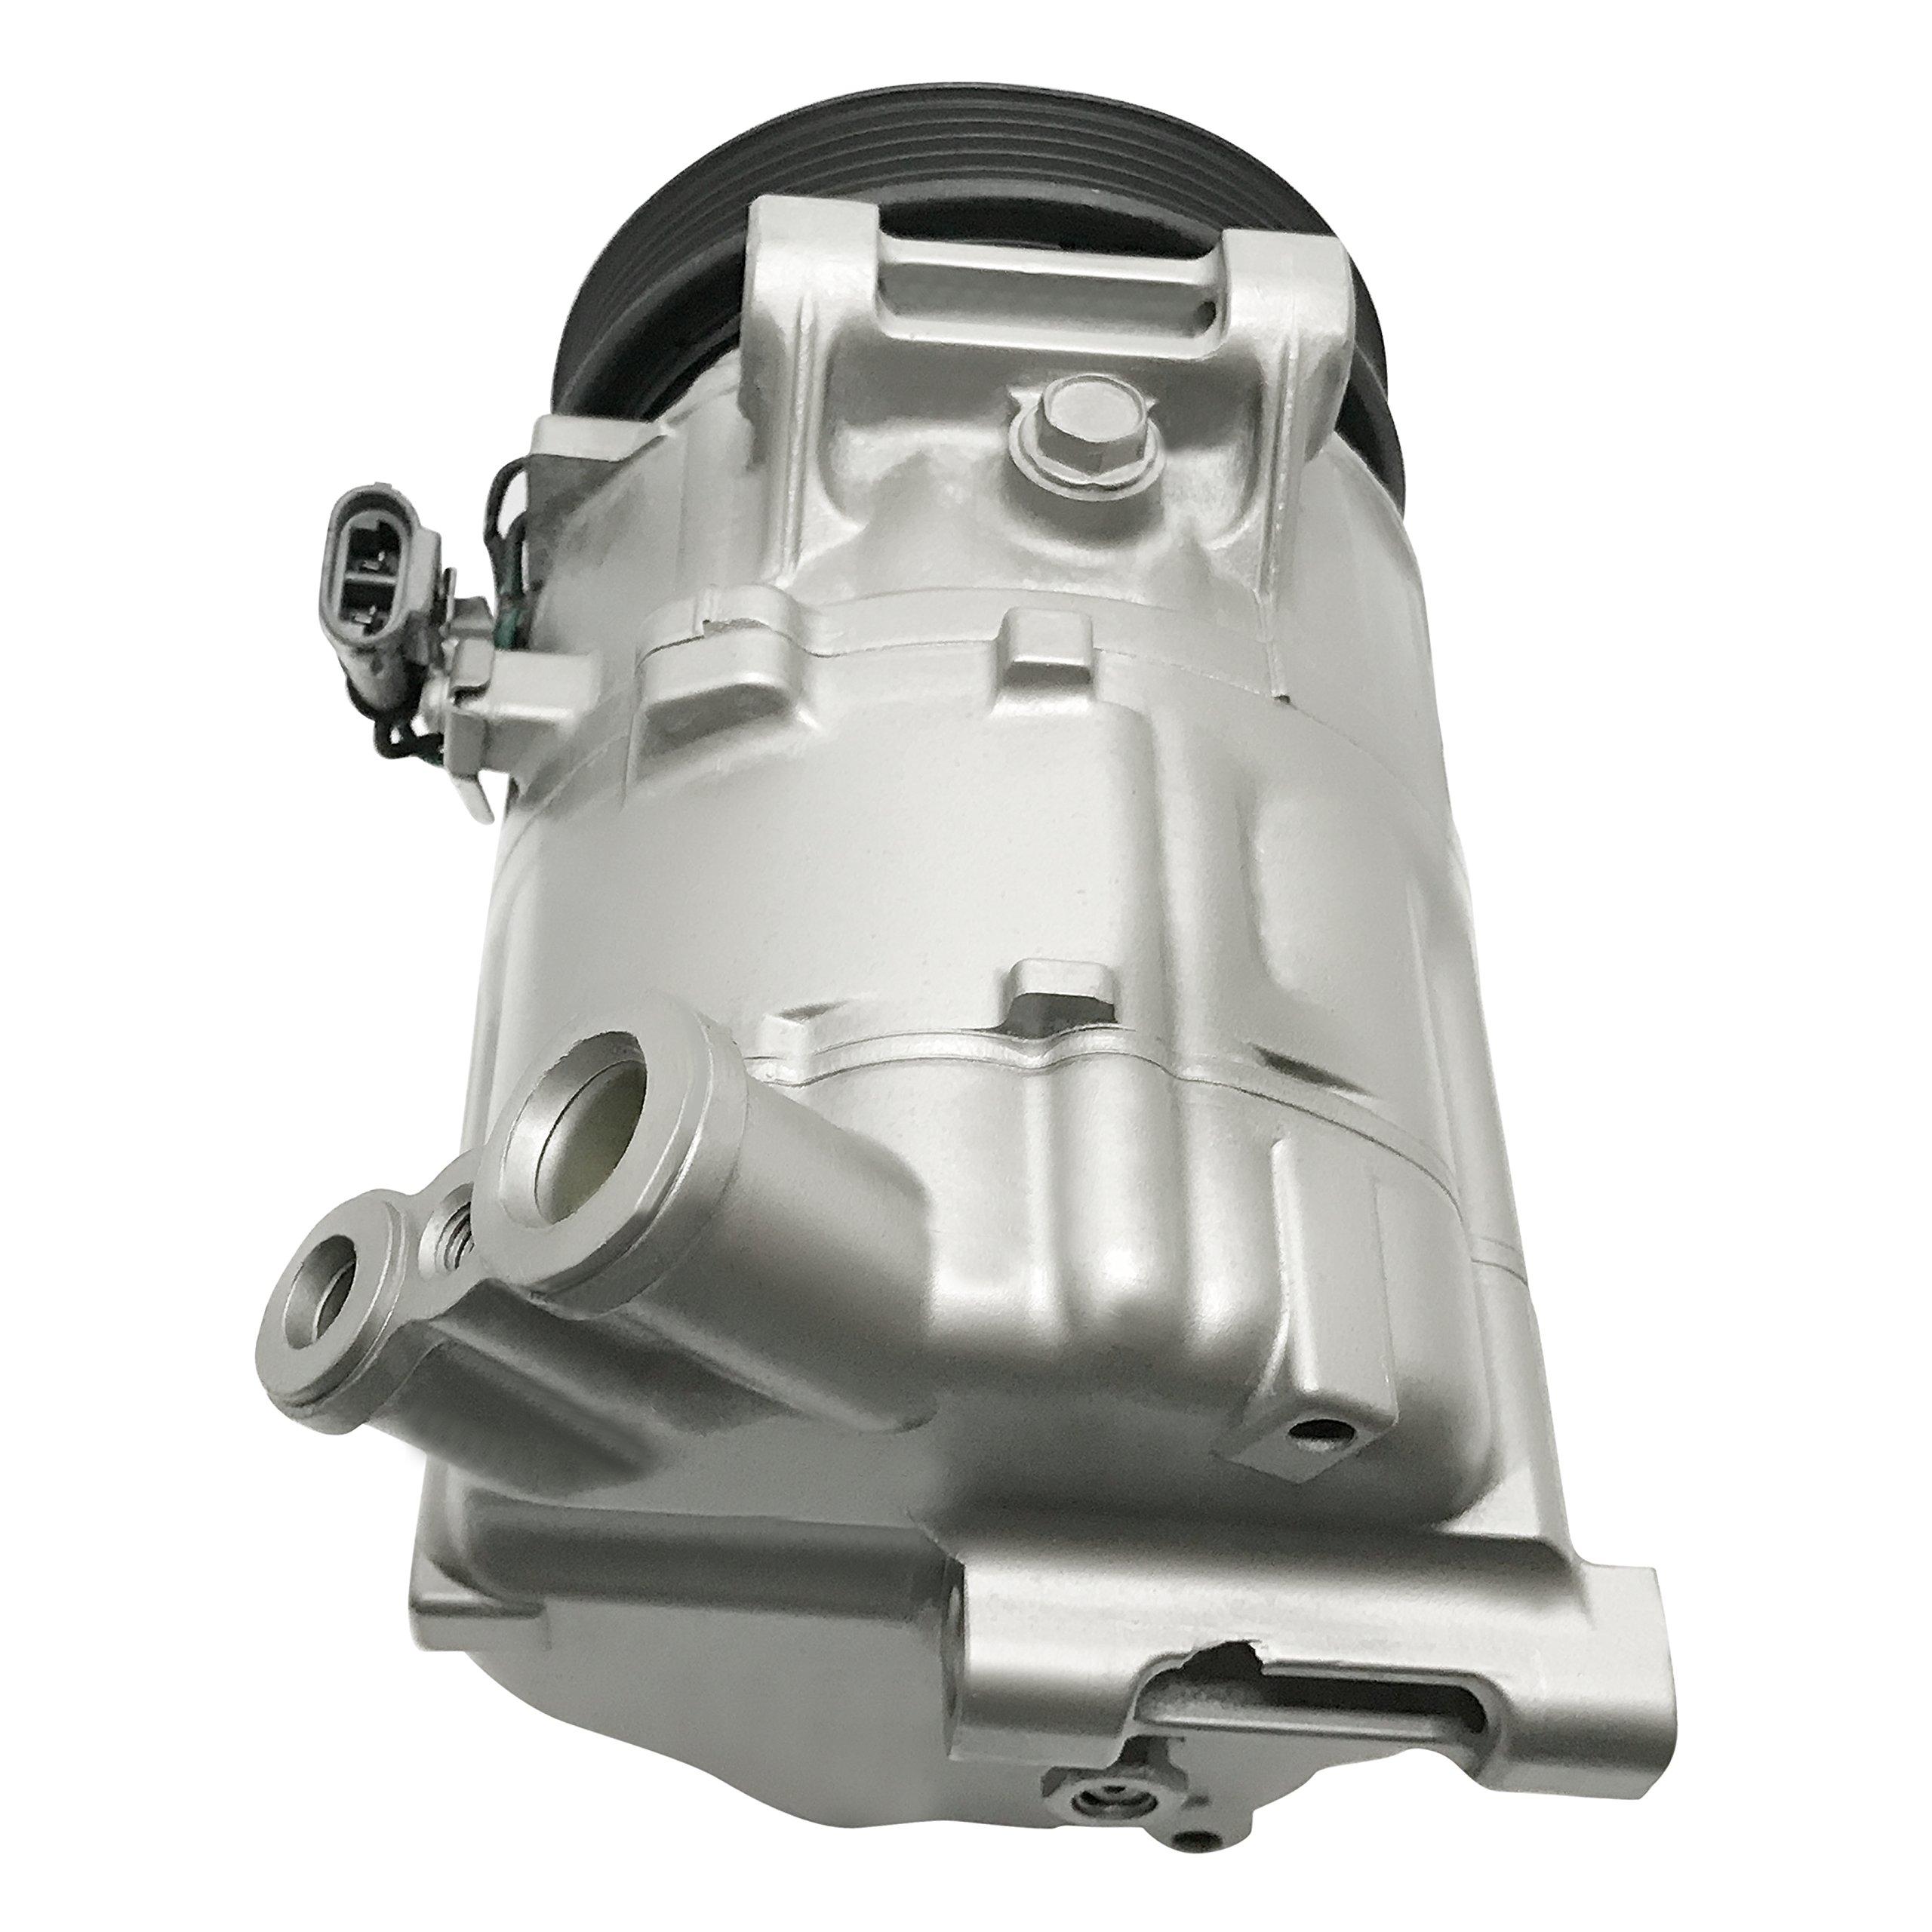 RYC Remanufactured AC Compressor and A/C Clutch IG556